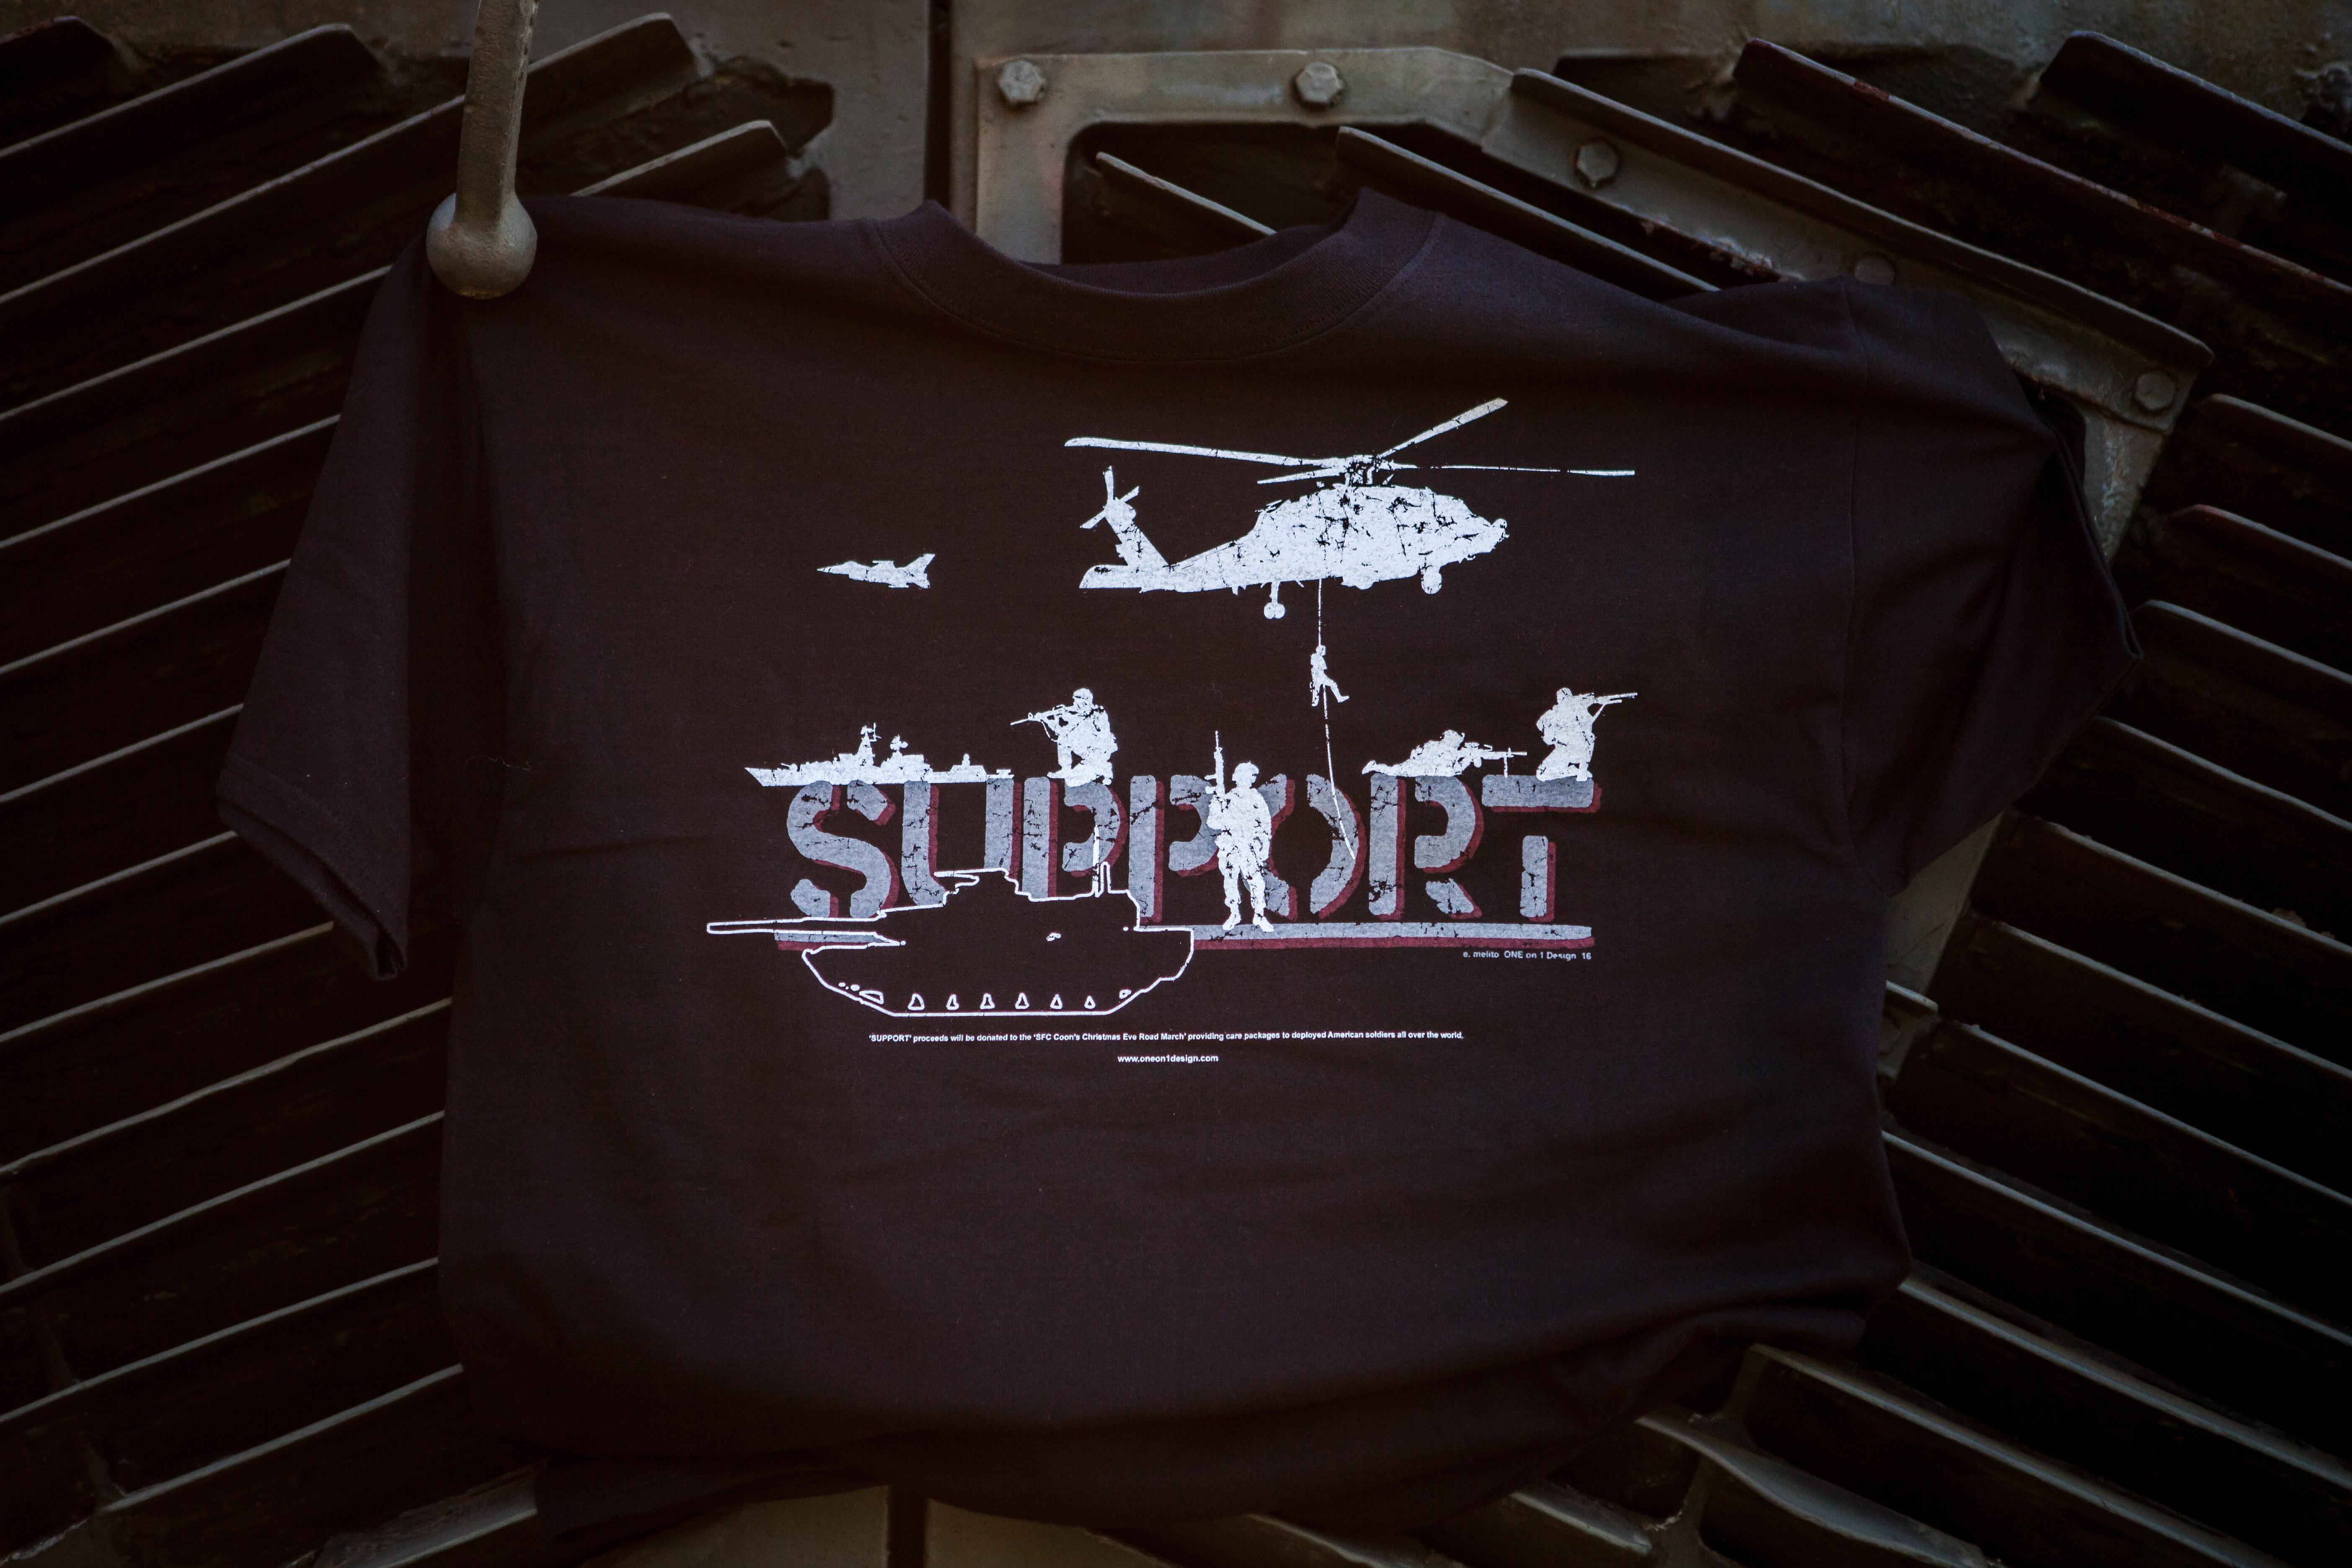 e1fafdef0 T Shirt Silk Screen Printing Designs - DREAMWORKS